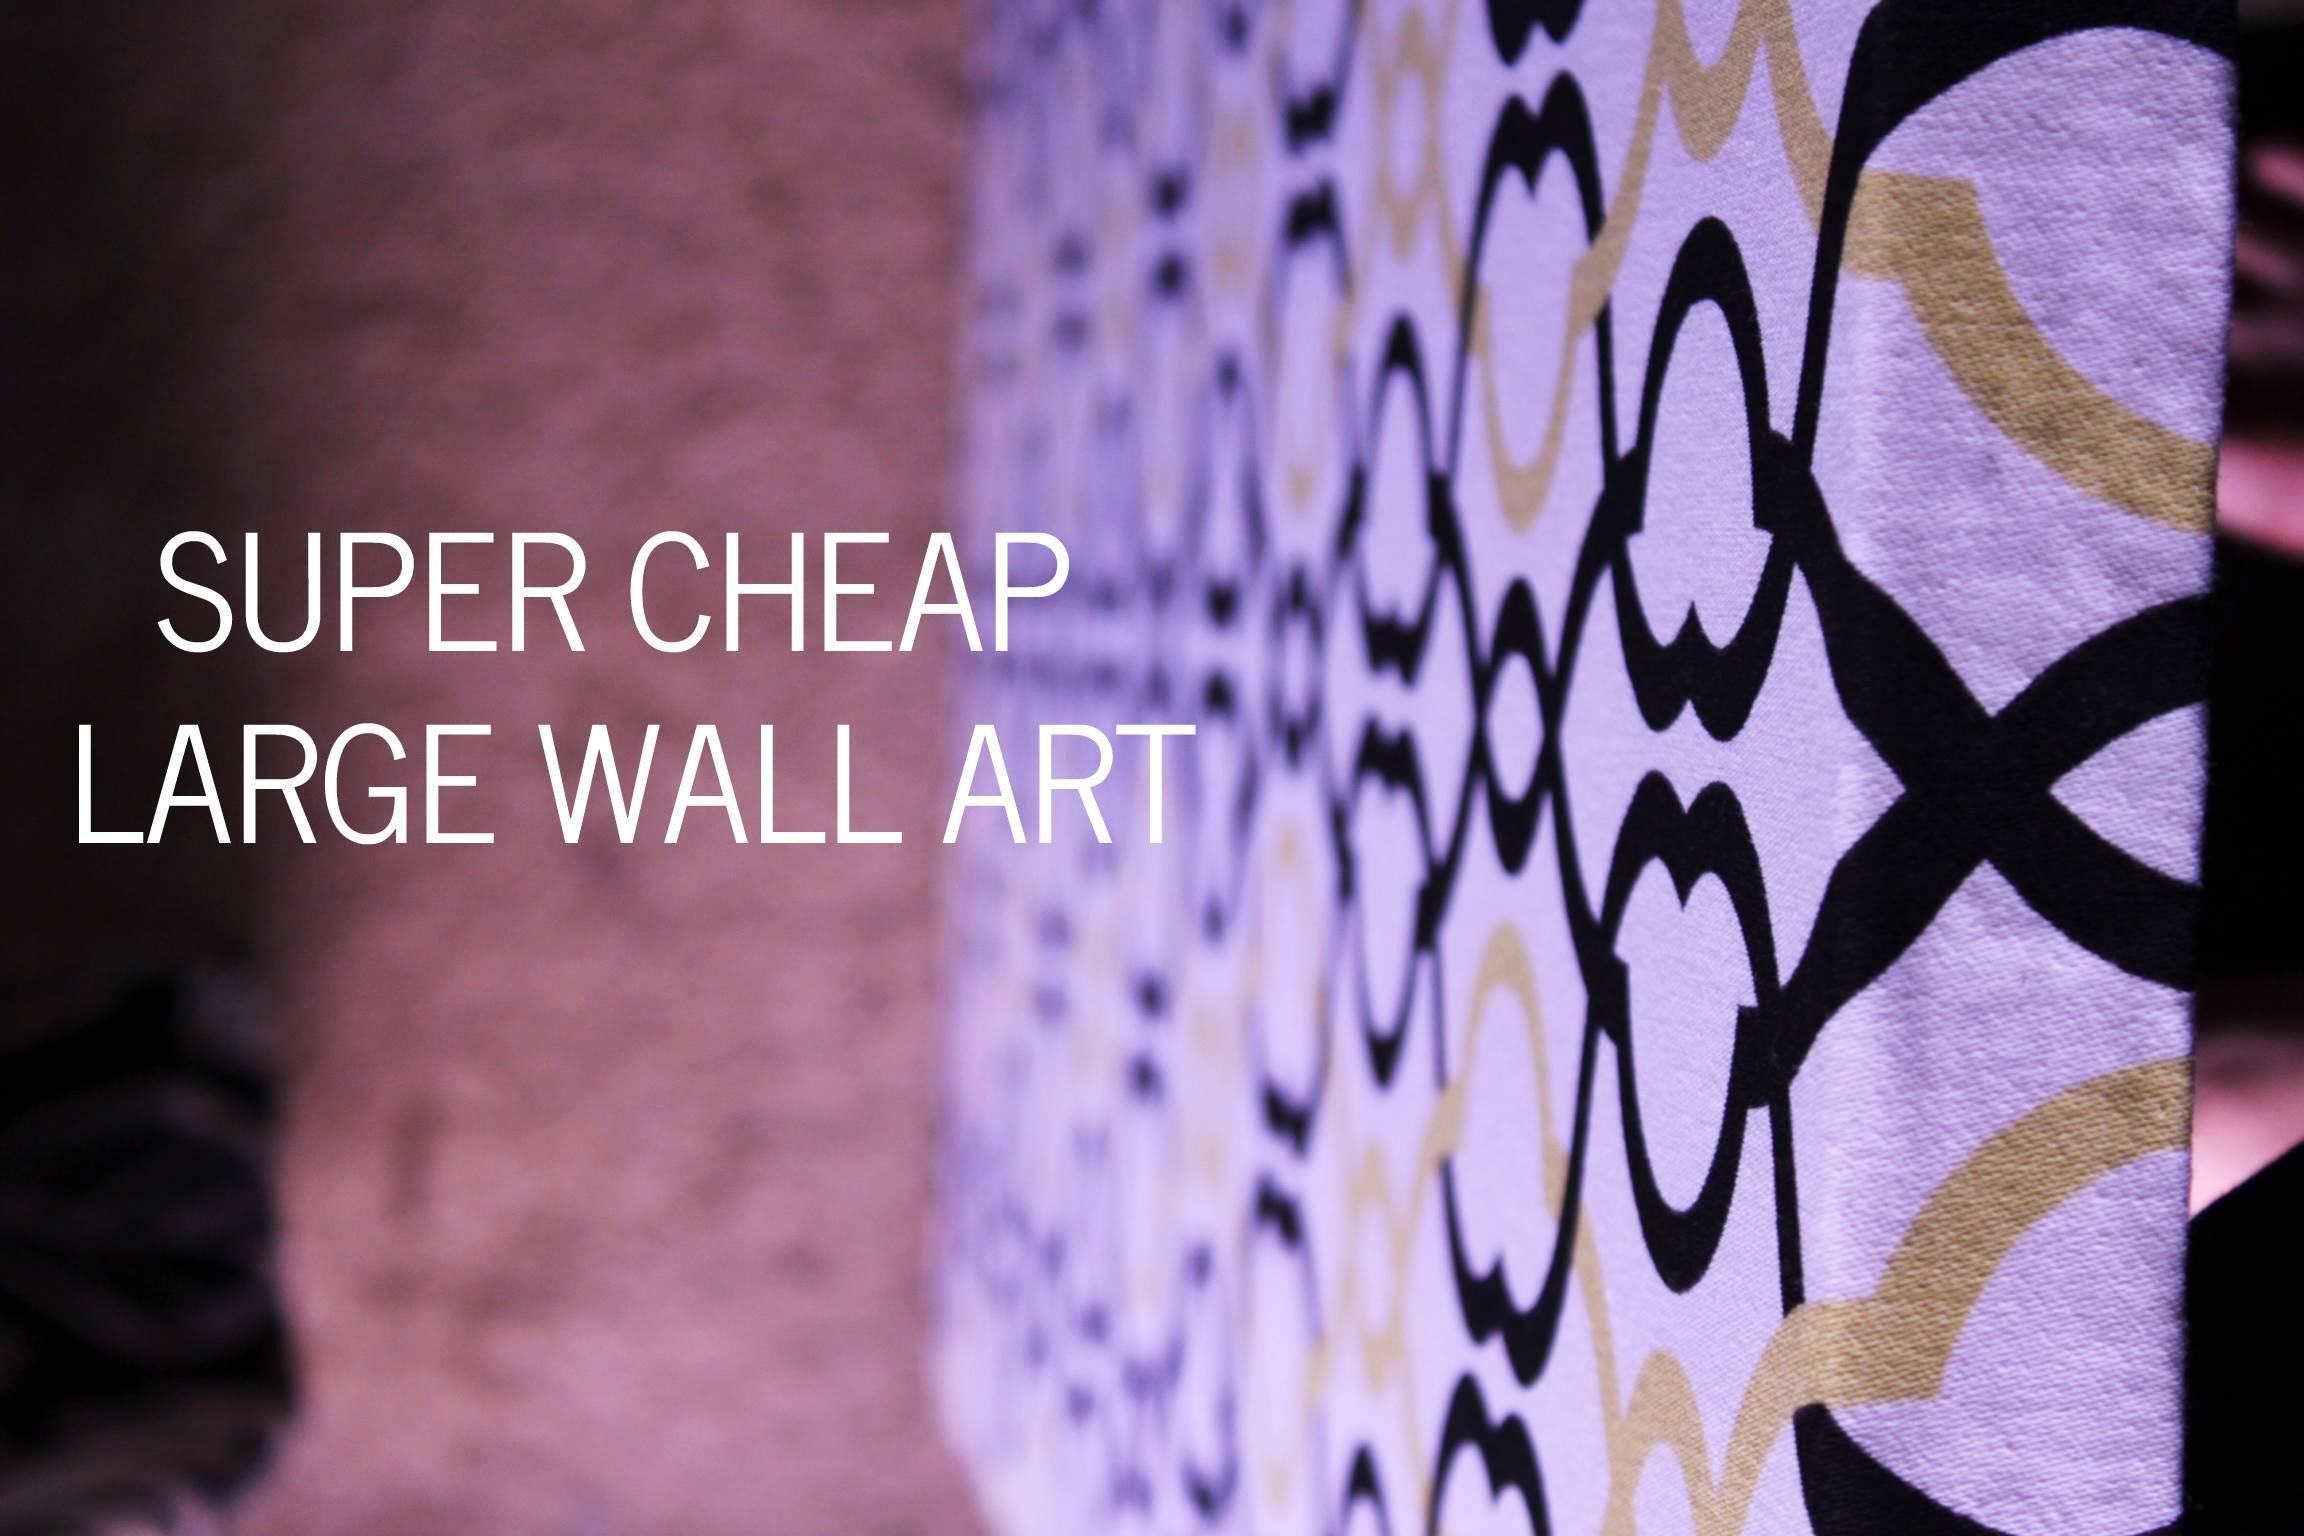 Wall Art Design Ideas: Purple Abstract Cheap Large Wall Art Super Regarding Most Recently Released Big Cheap Wall Art (View 17 of 20)